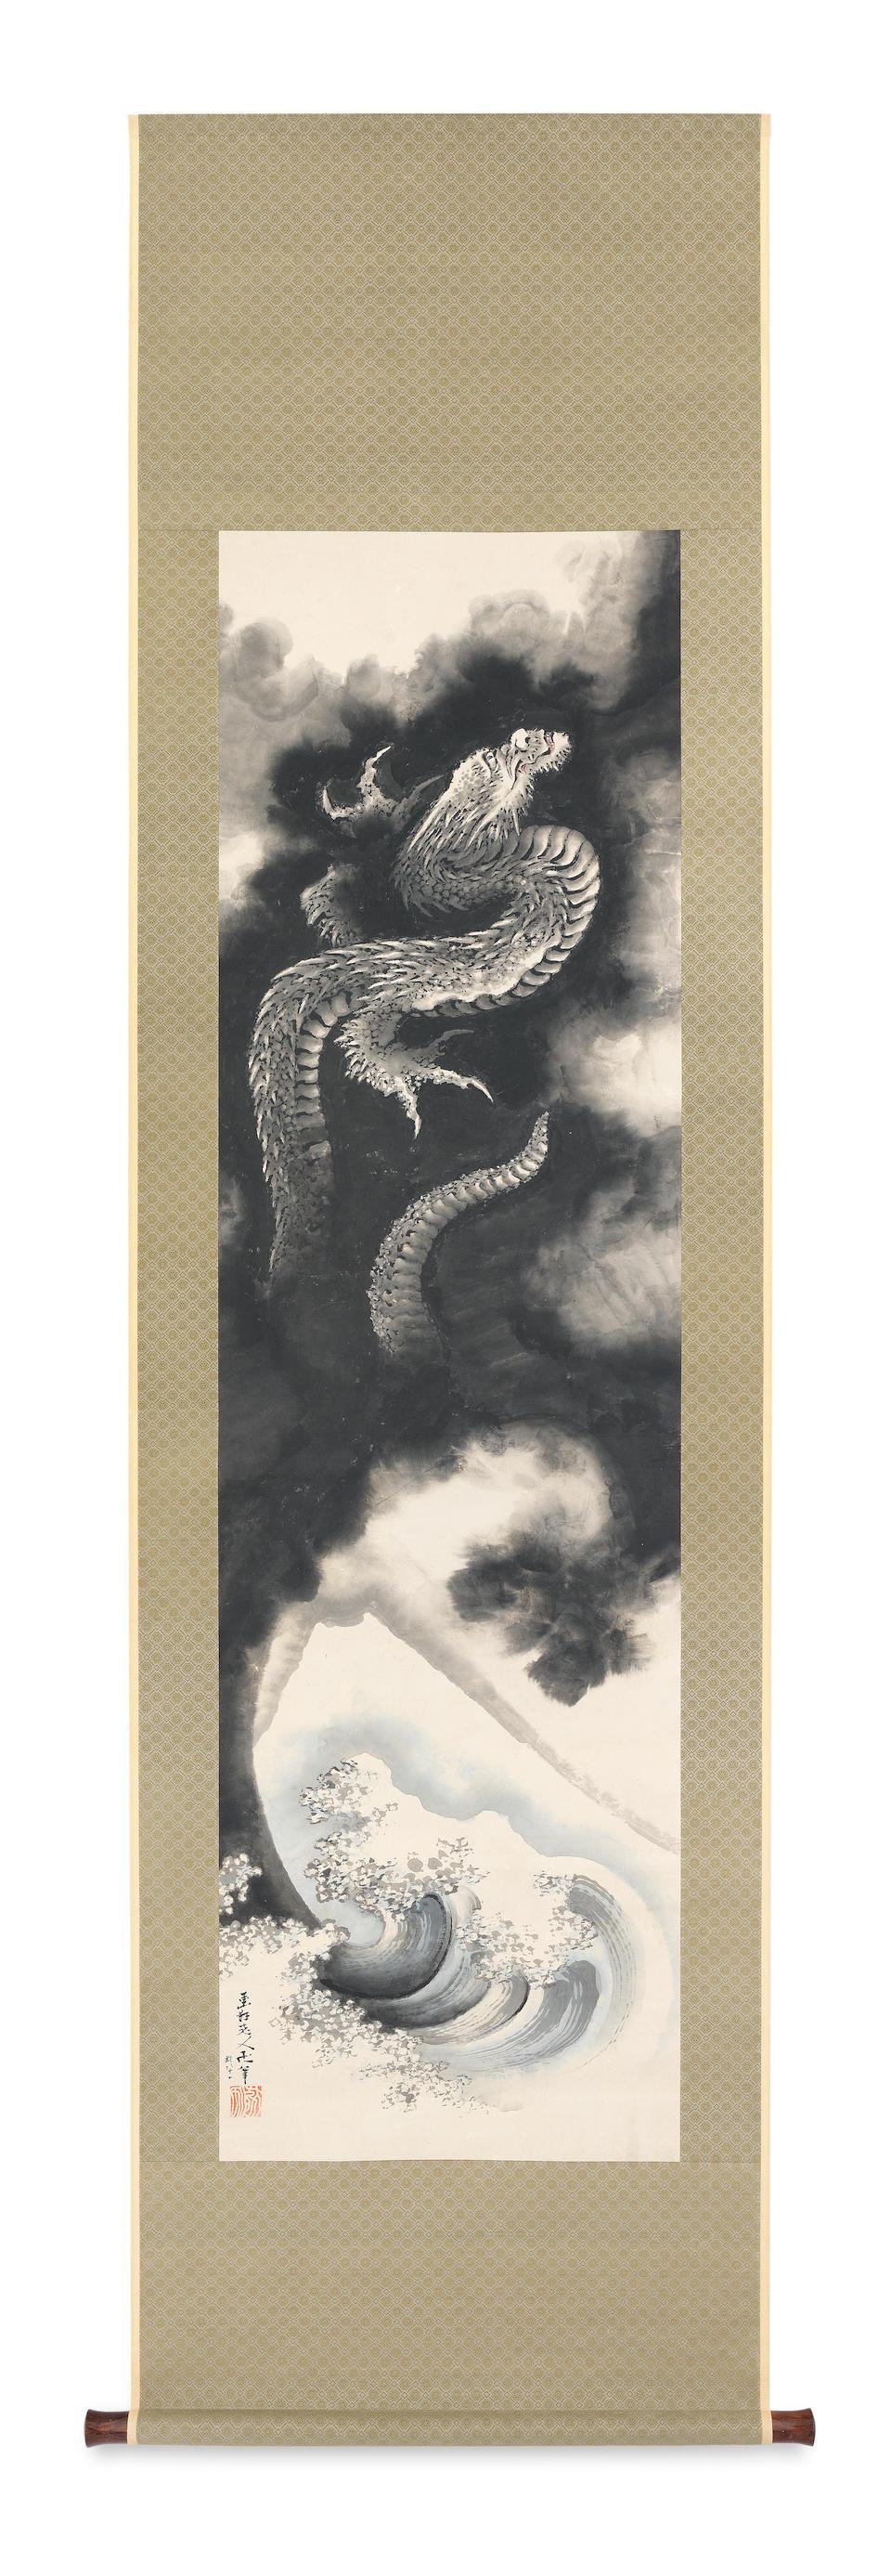 Katsushika Hokusai (1760–1849) Ascending Dragon Edo period (1615-1868), dated 1840 (3)